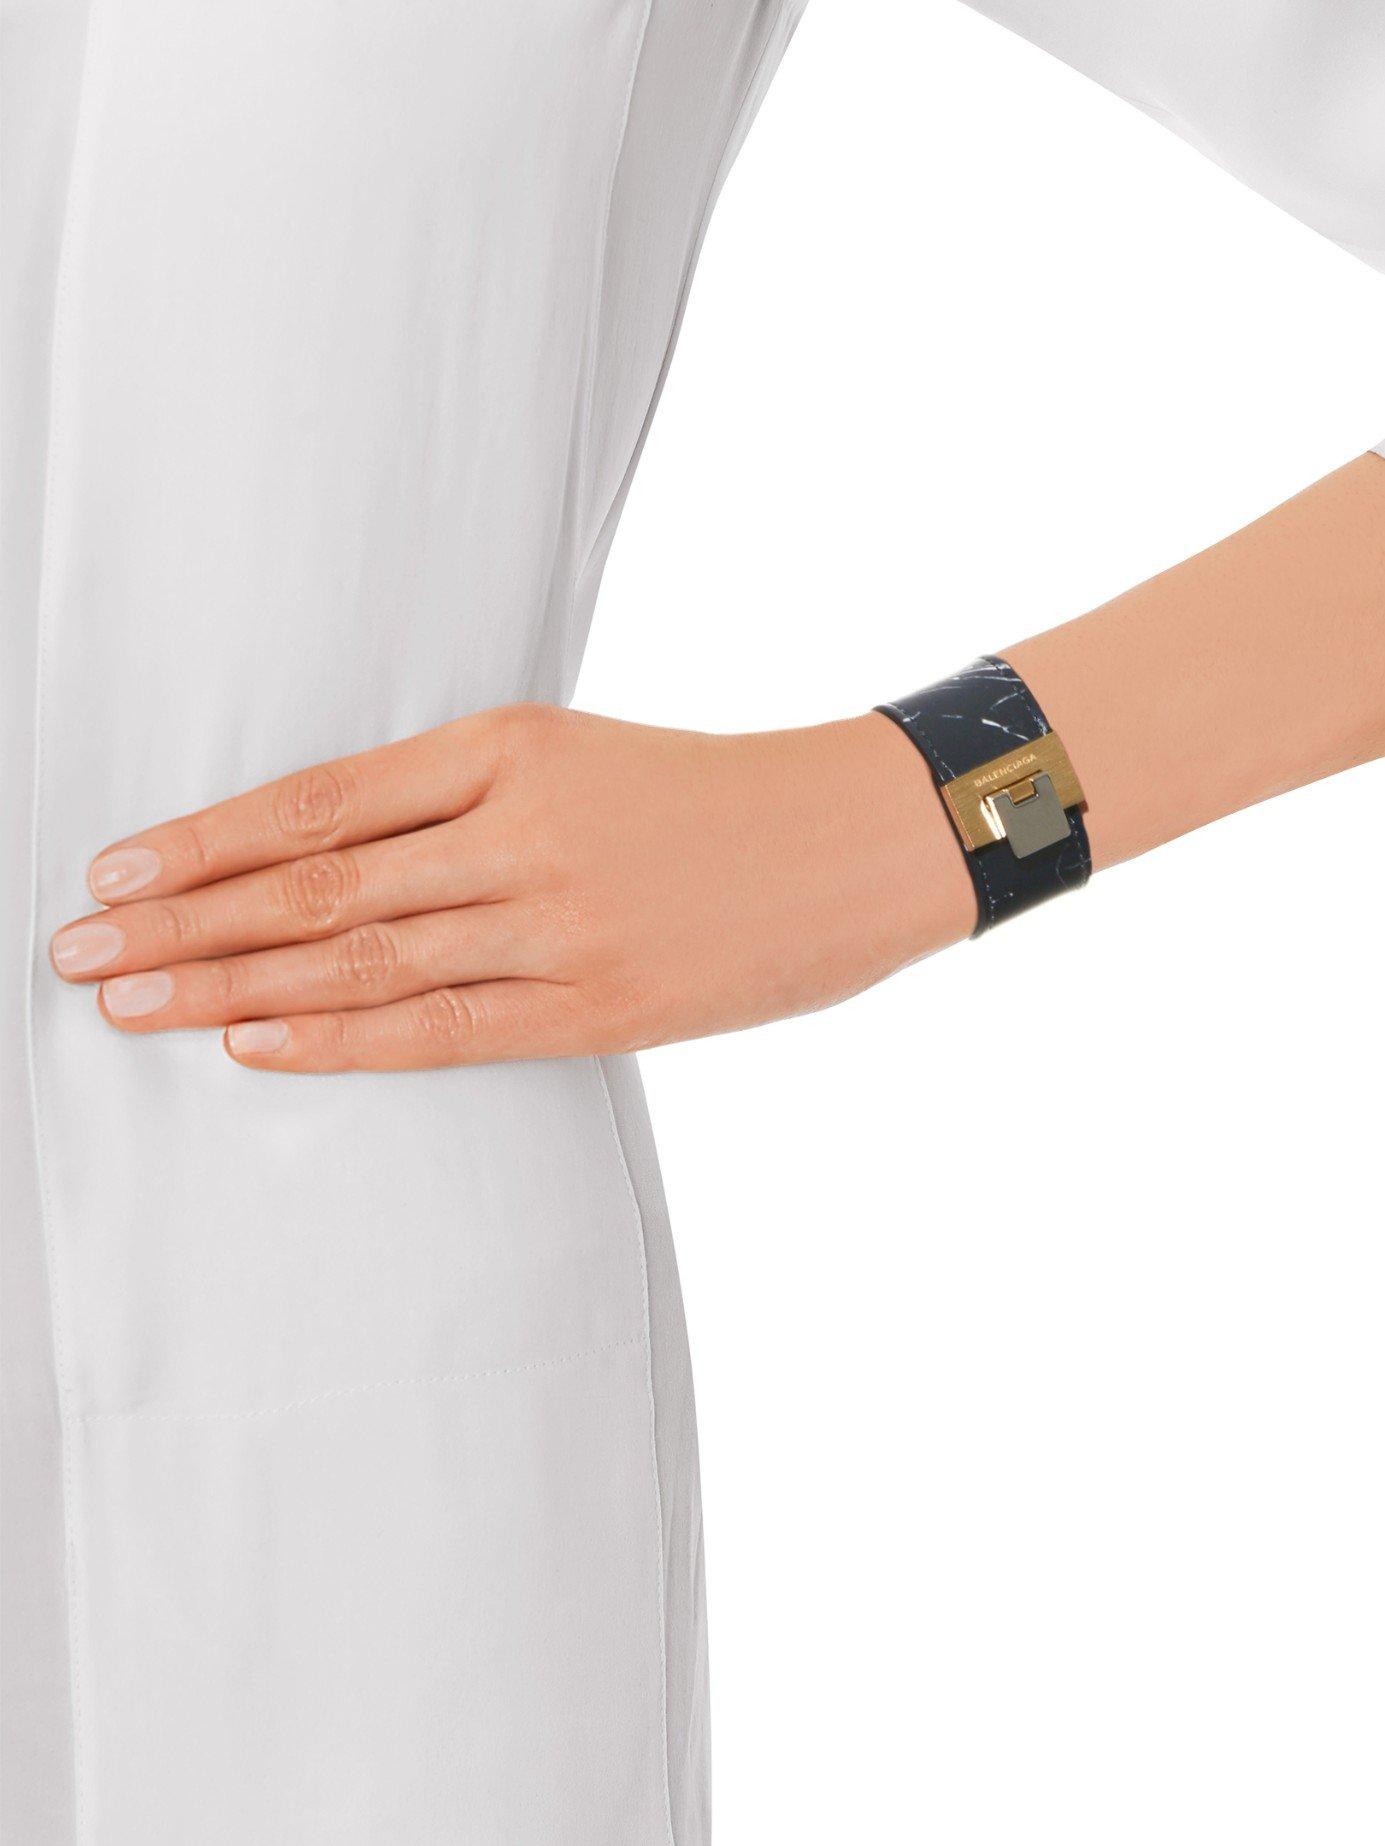 e4a344c5ad5c5 Lyst - Balenciaga Le Dix Marble-Print Leather Cuff in Black